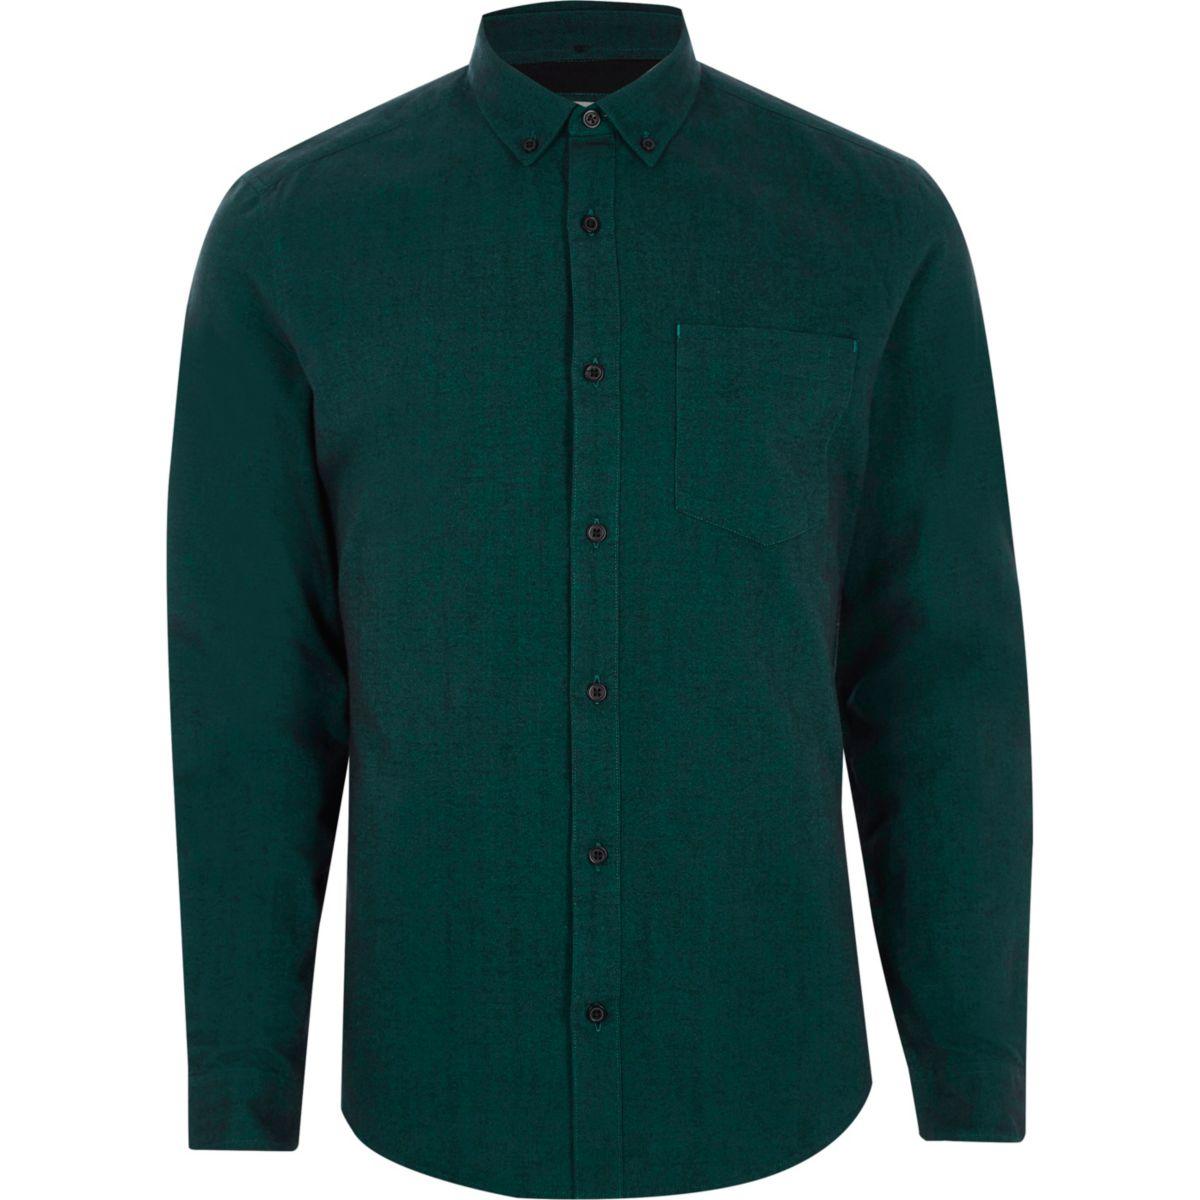 Teal Slim Fit Long Sleeve Oxford Shirt Shirts Sale Men